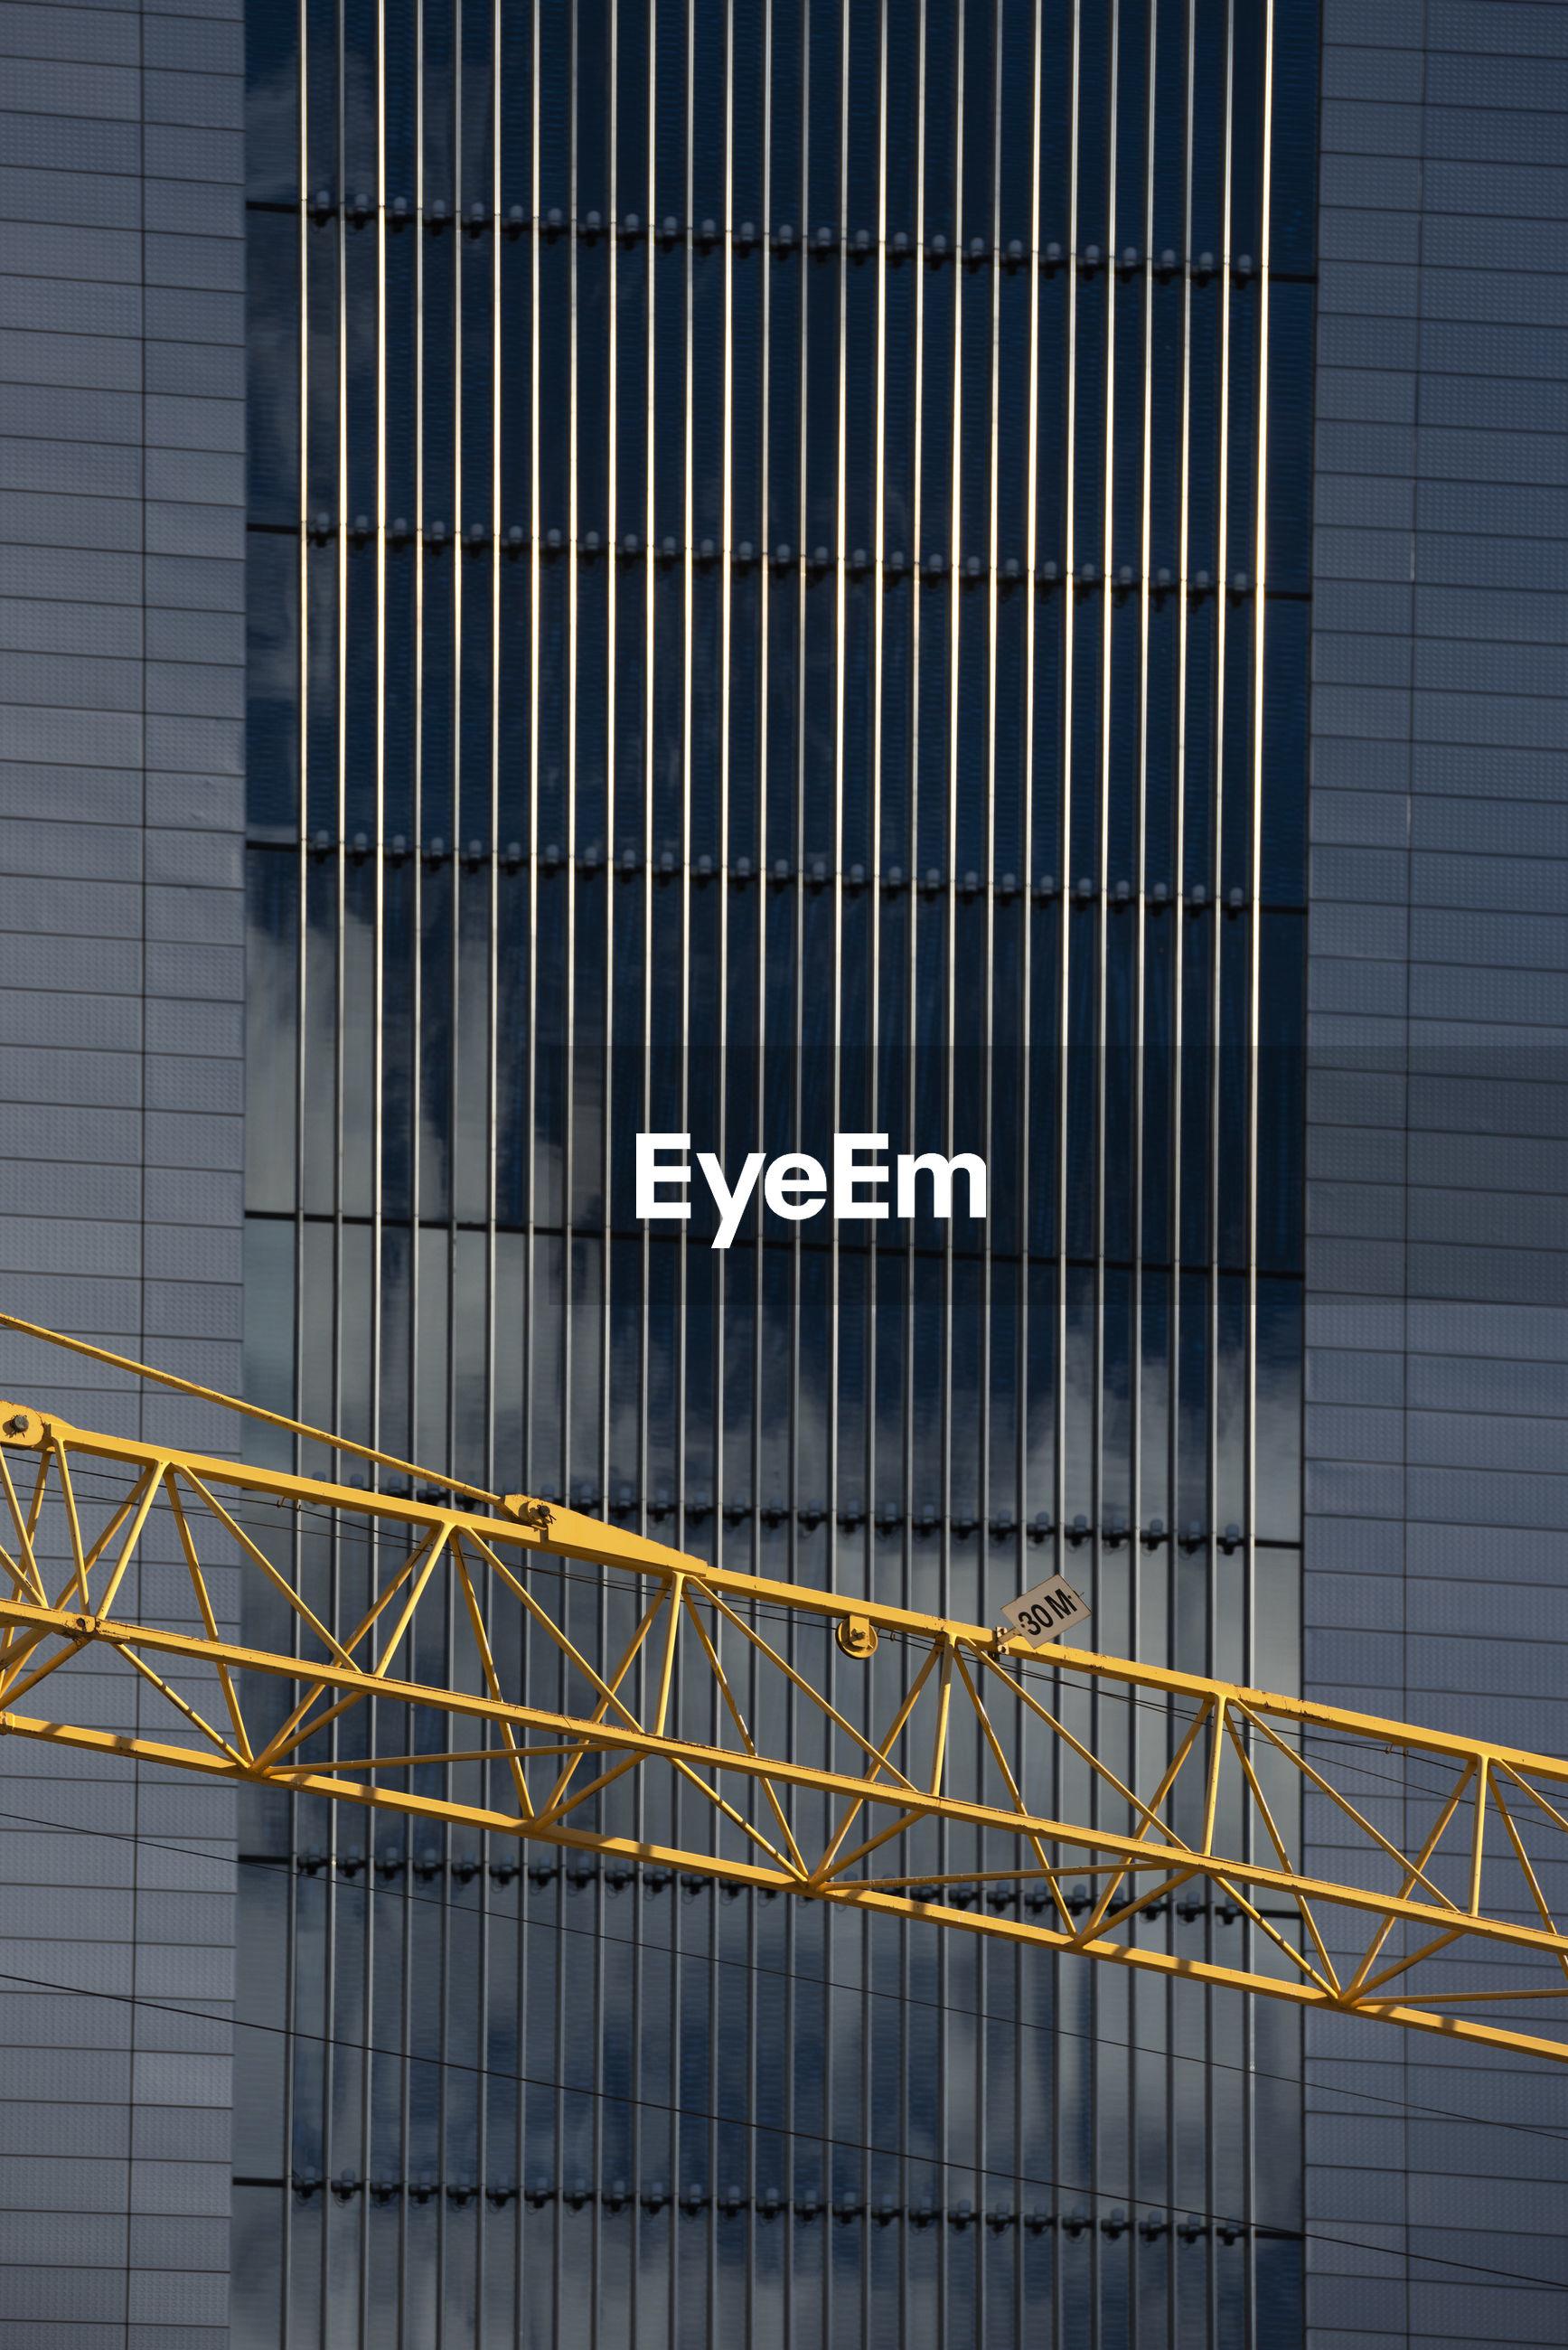 Metal railing of modern building and crane